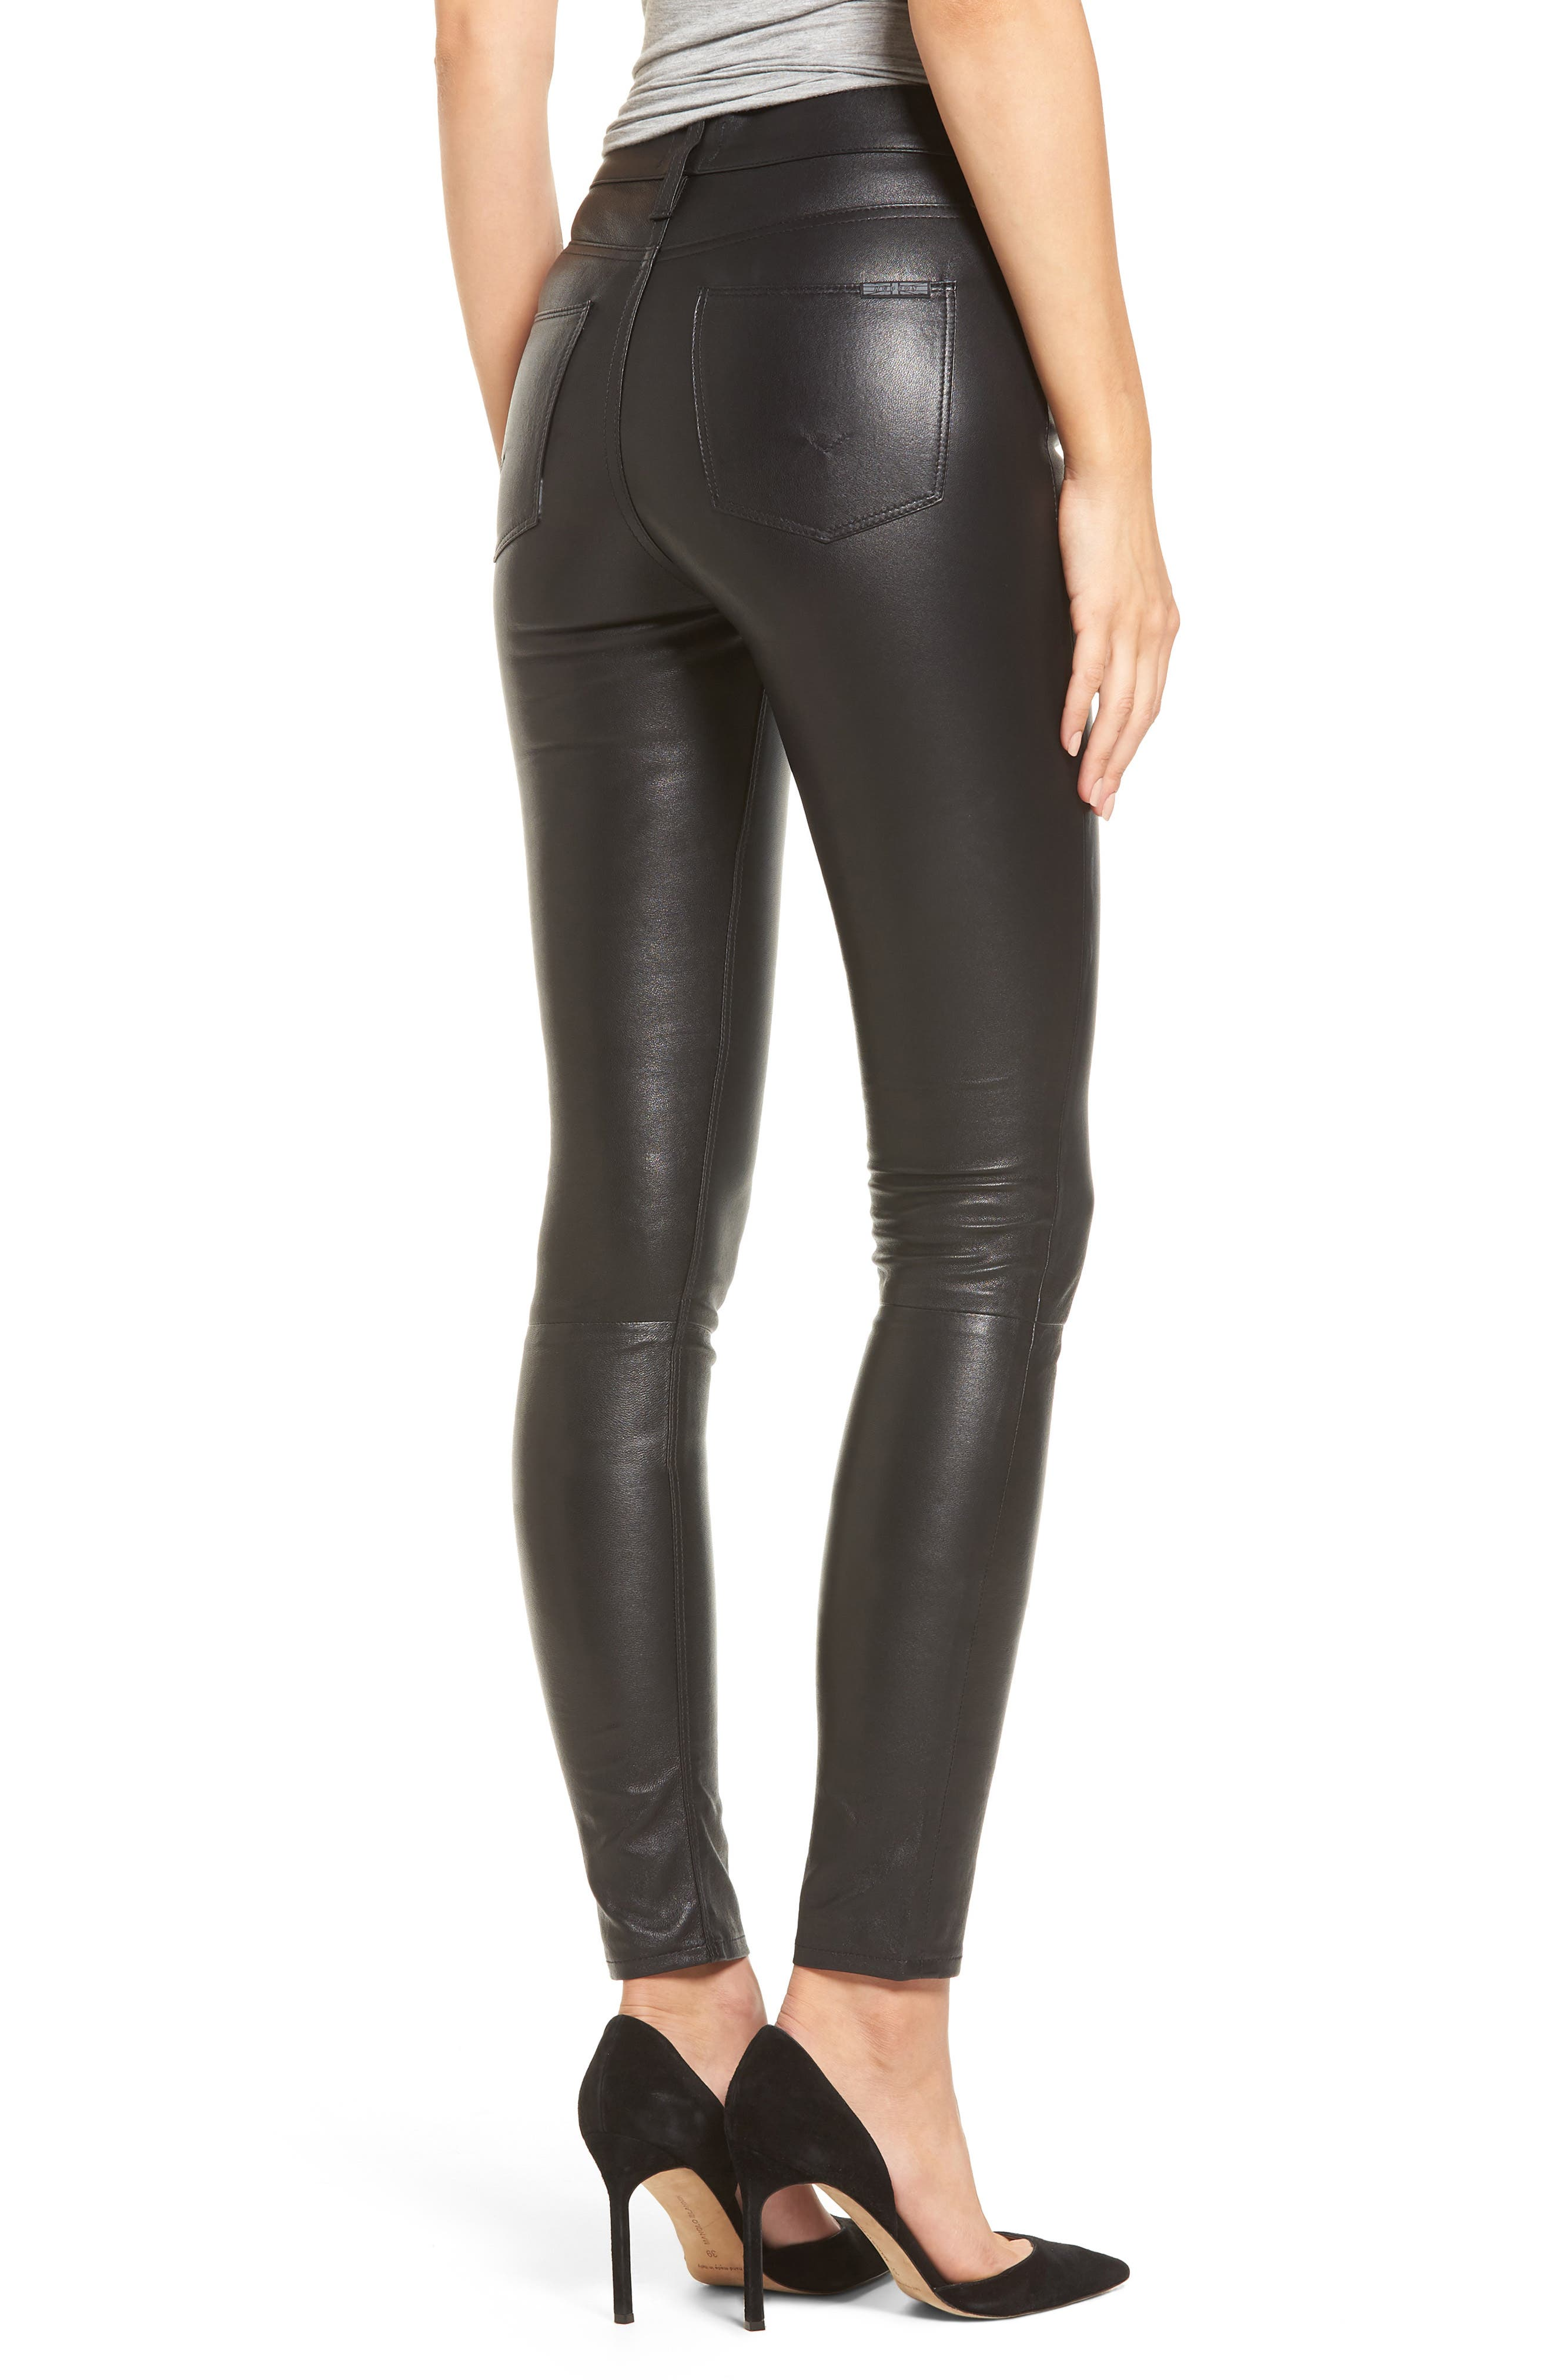 Barbara High Waist Ankle Skinny Leather Pants,                             Alternate thumbnail 2, color,                             Black Leather